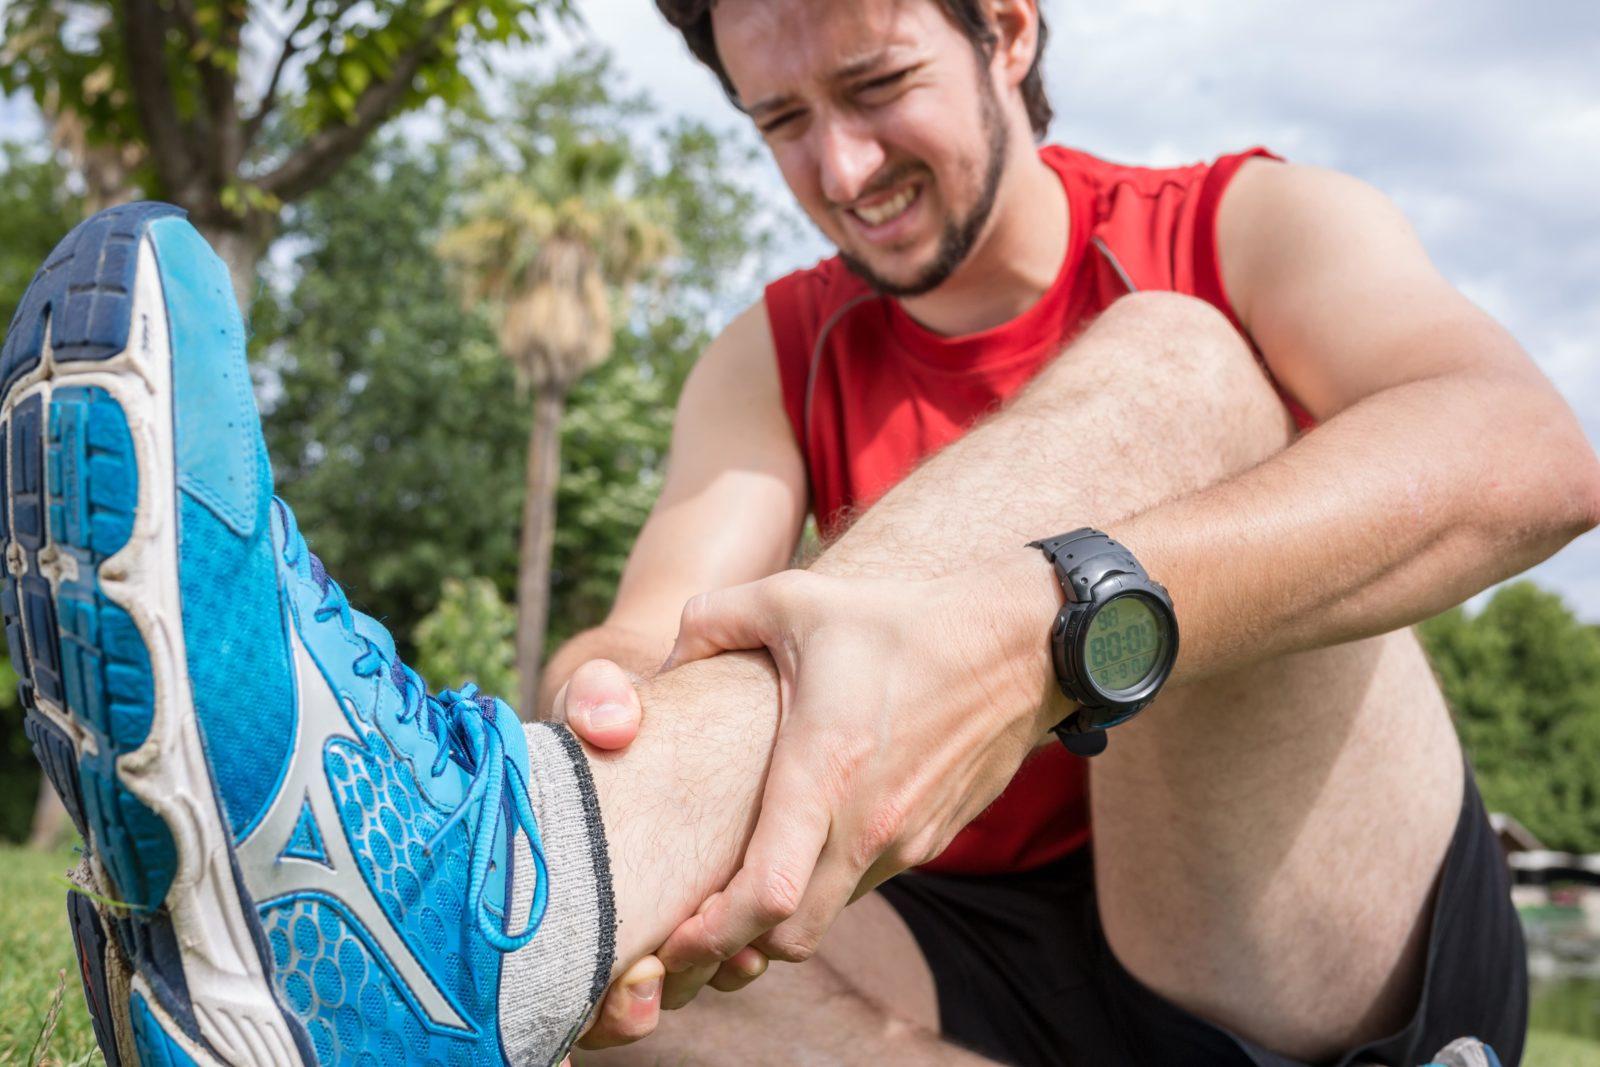 acute blessure laten behandelen in sport medisch centrum papendal